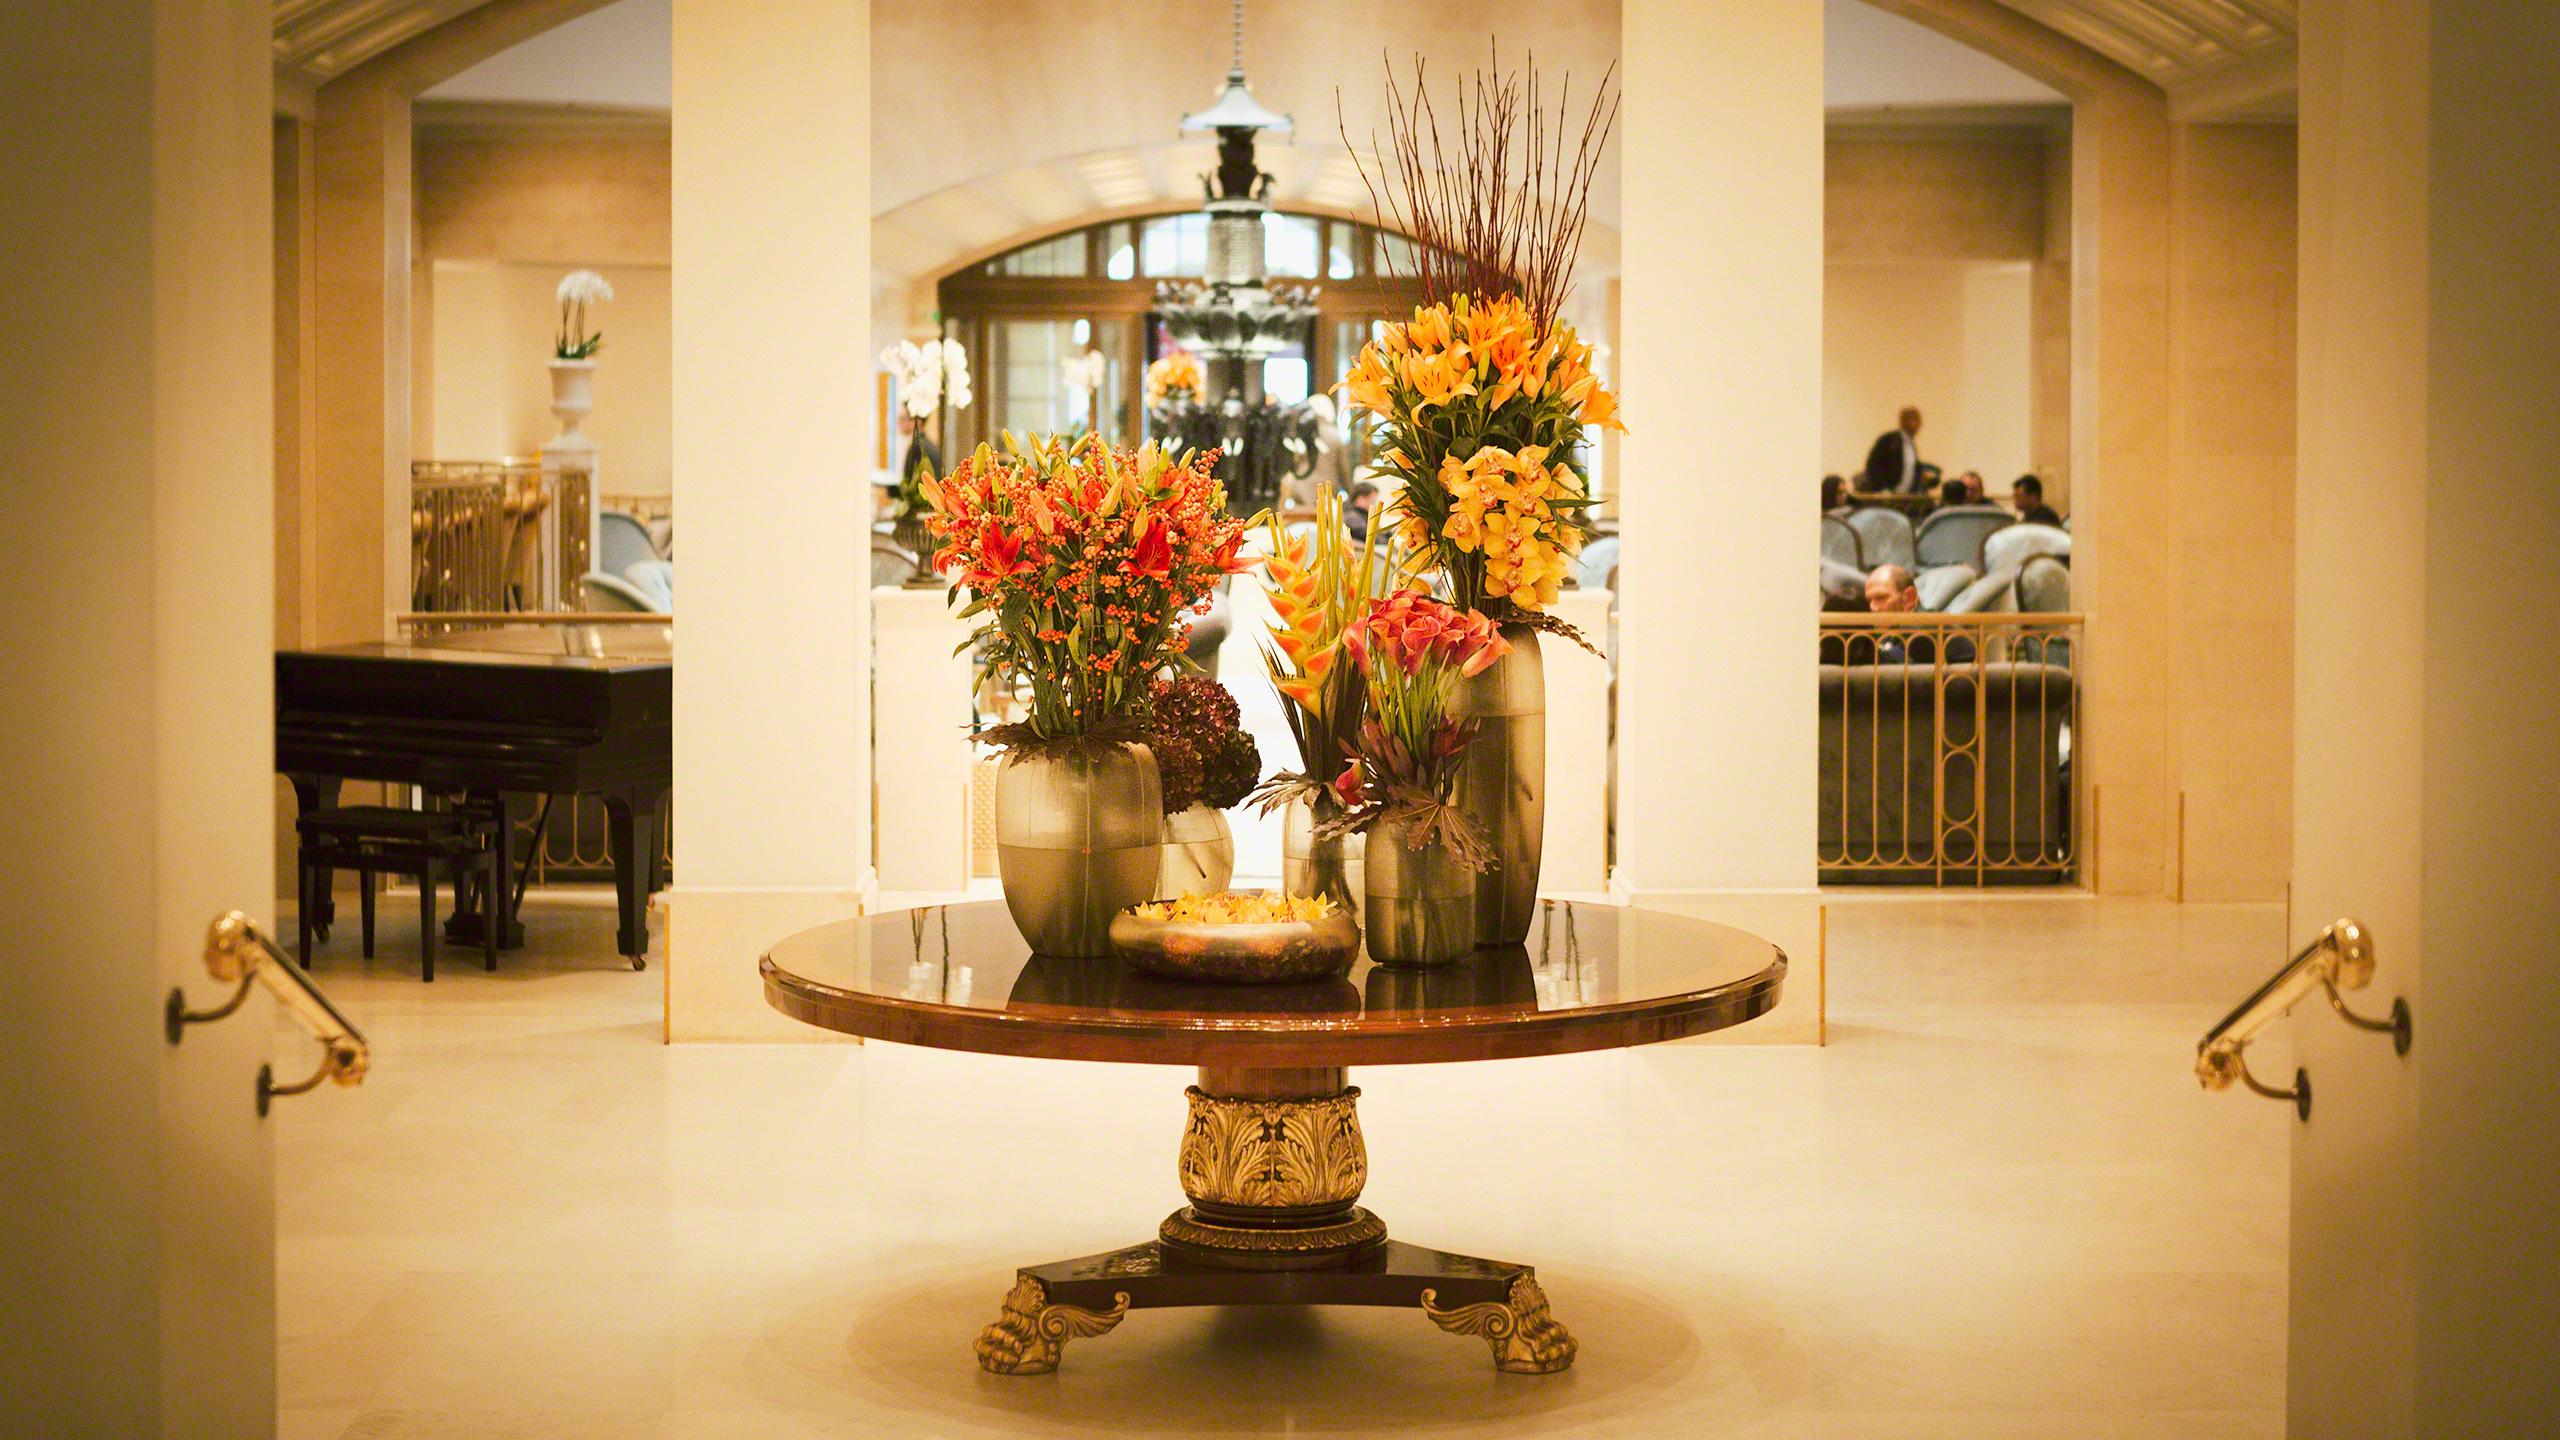 Luxushotel Adlon Kempinski Berlin Lobby mit Piano